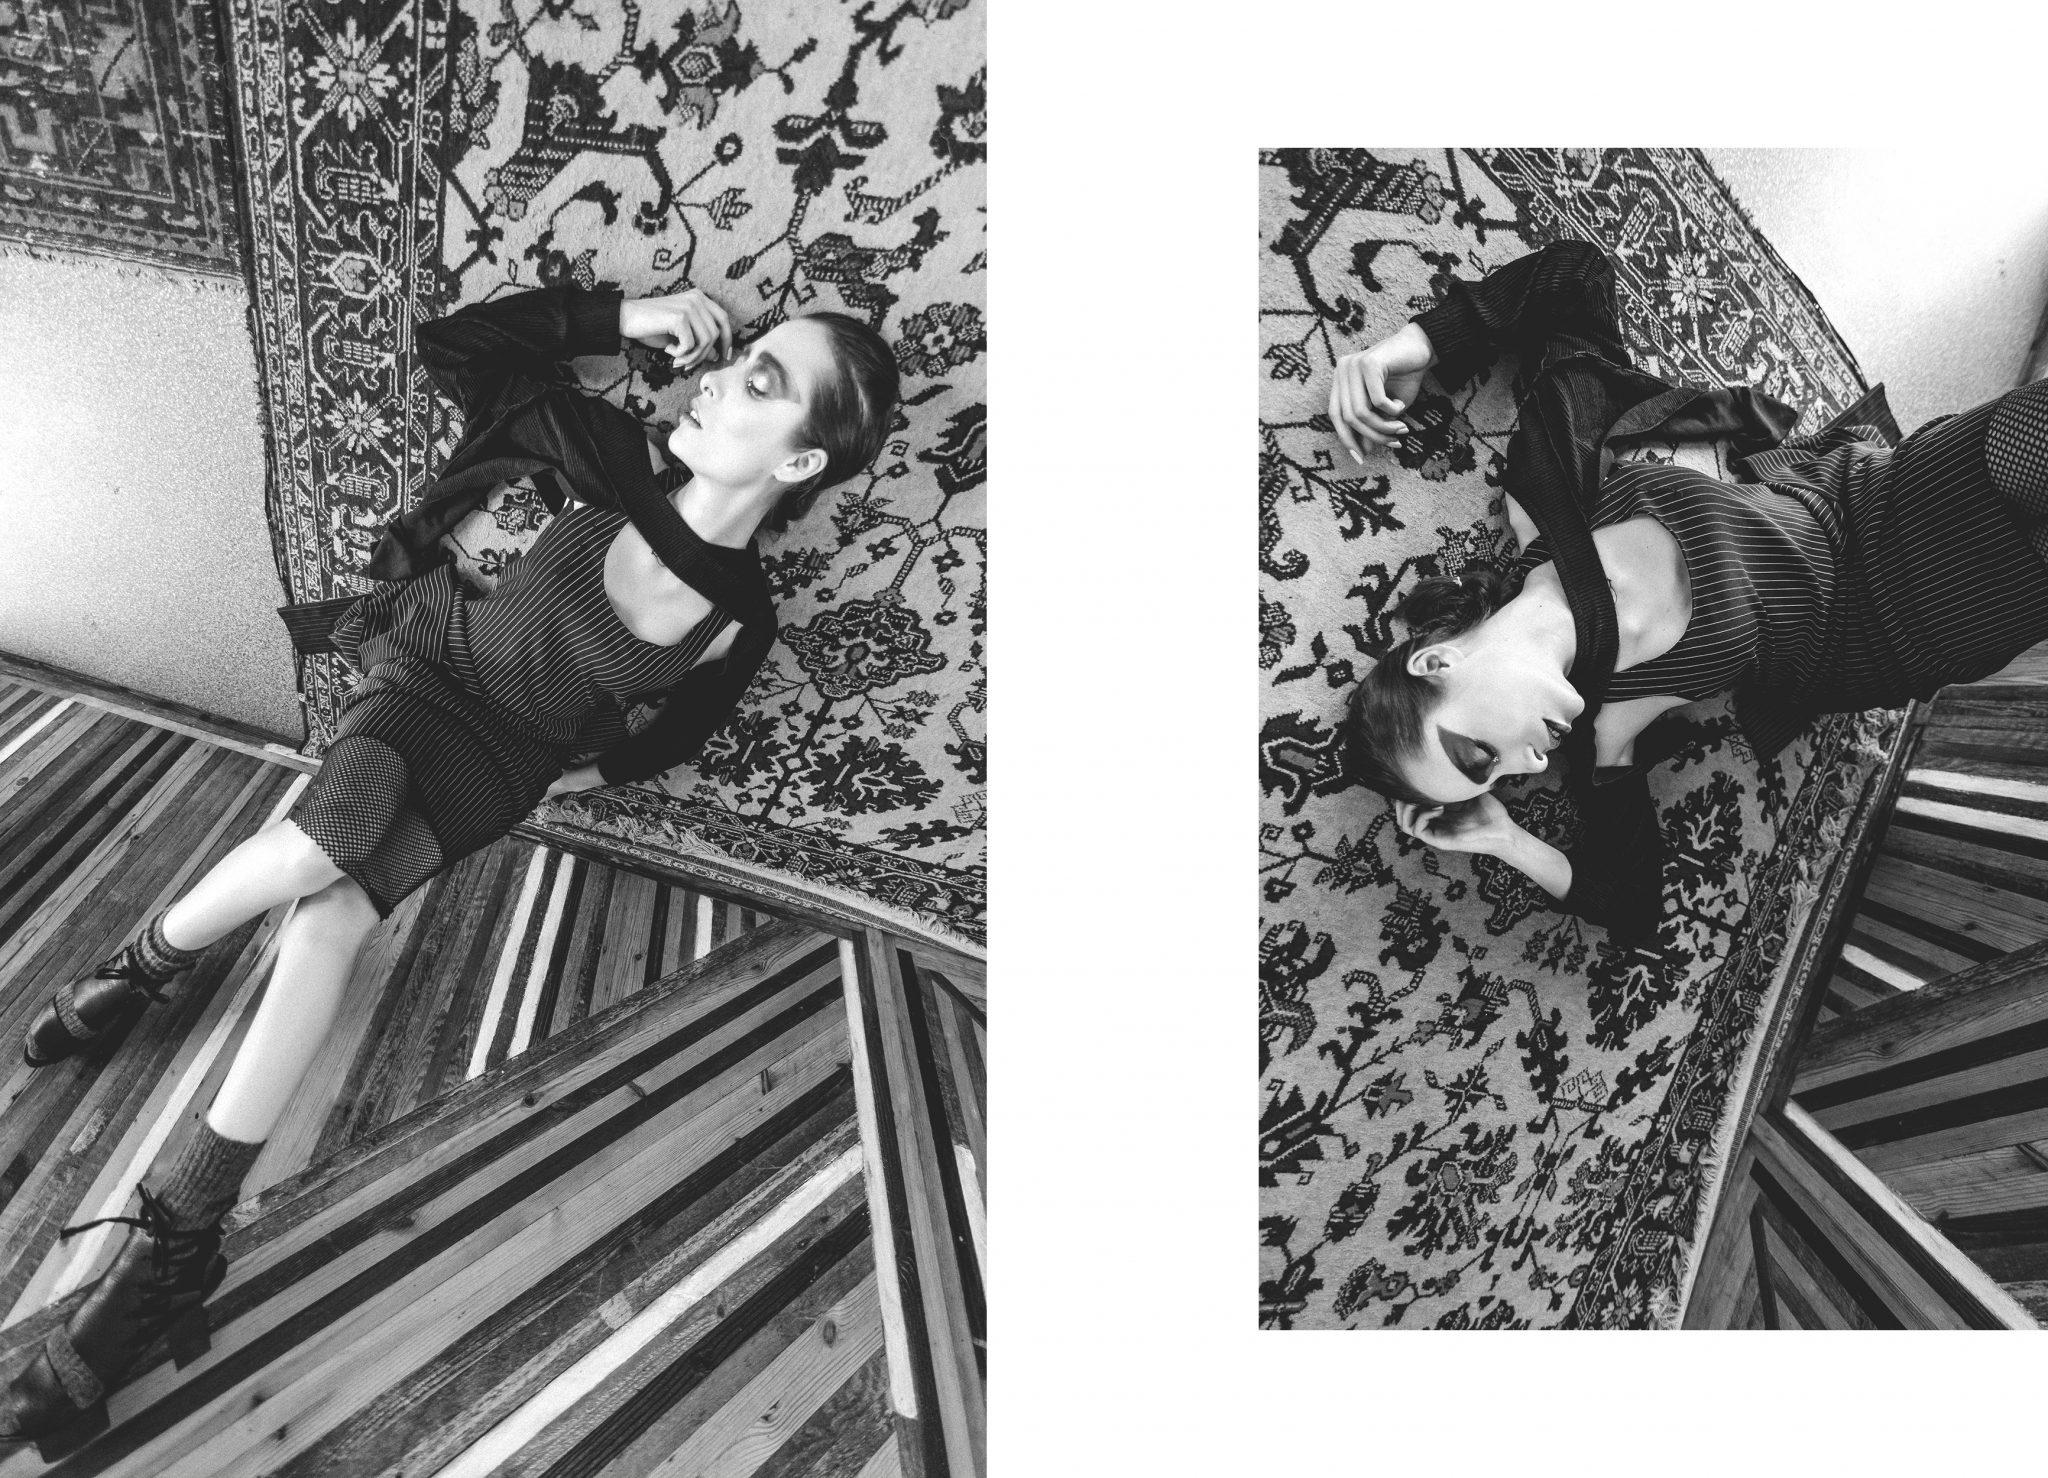 nomad fashion story editorial webditorial le dernier etage magazine webzine shooting Karolina Orzechowska